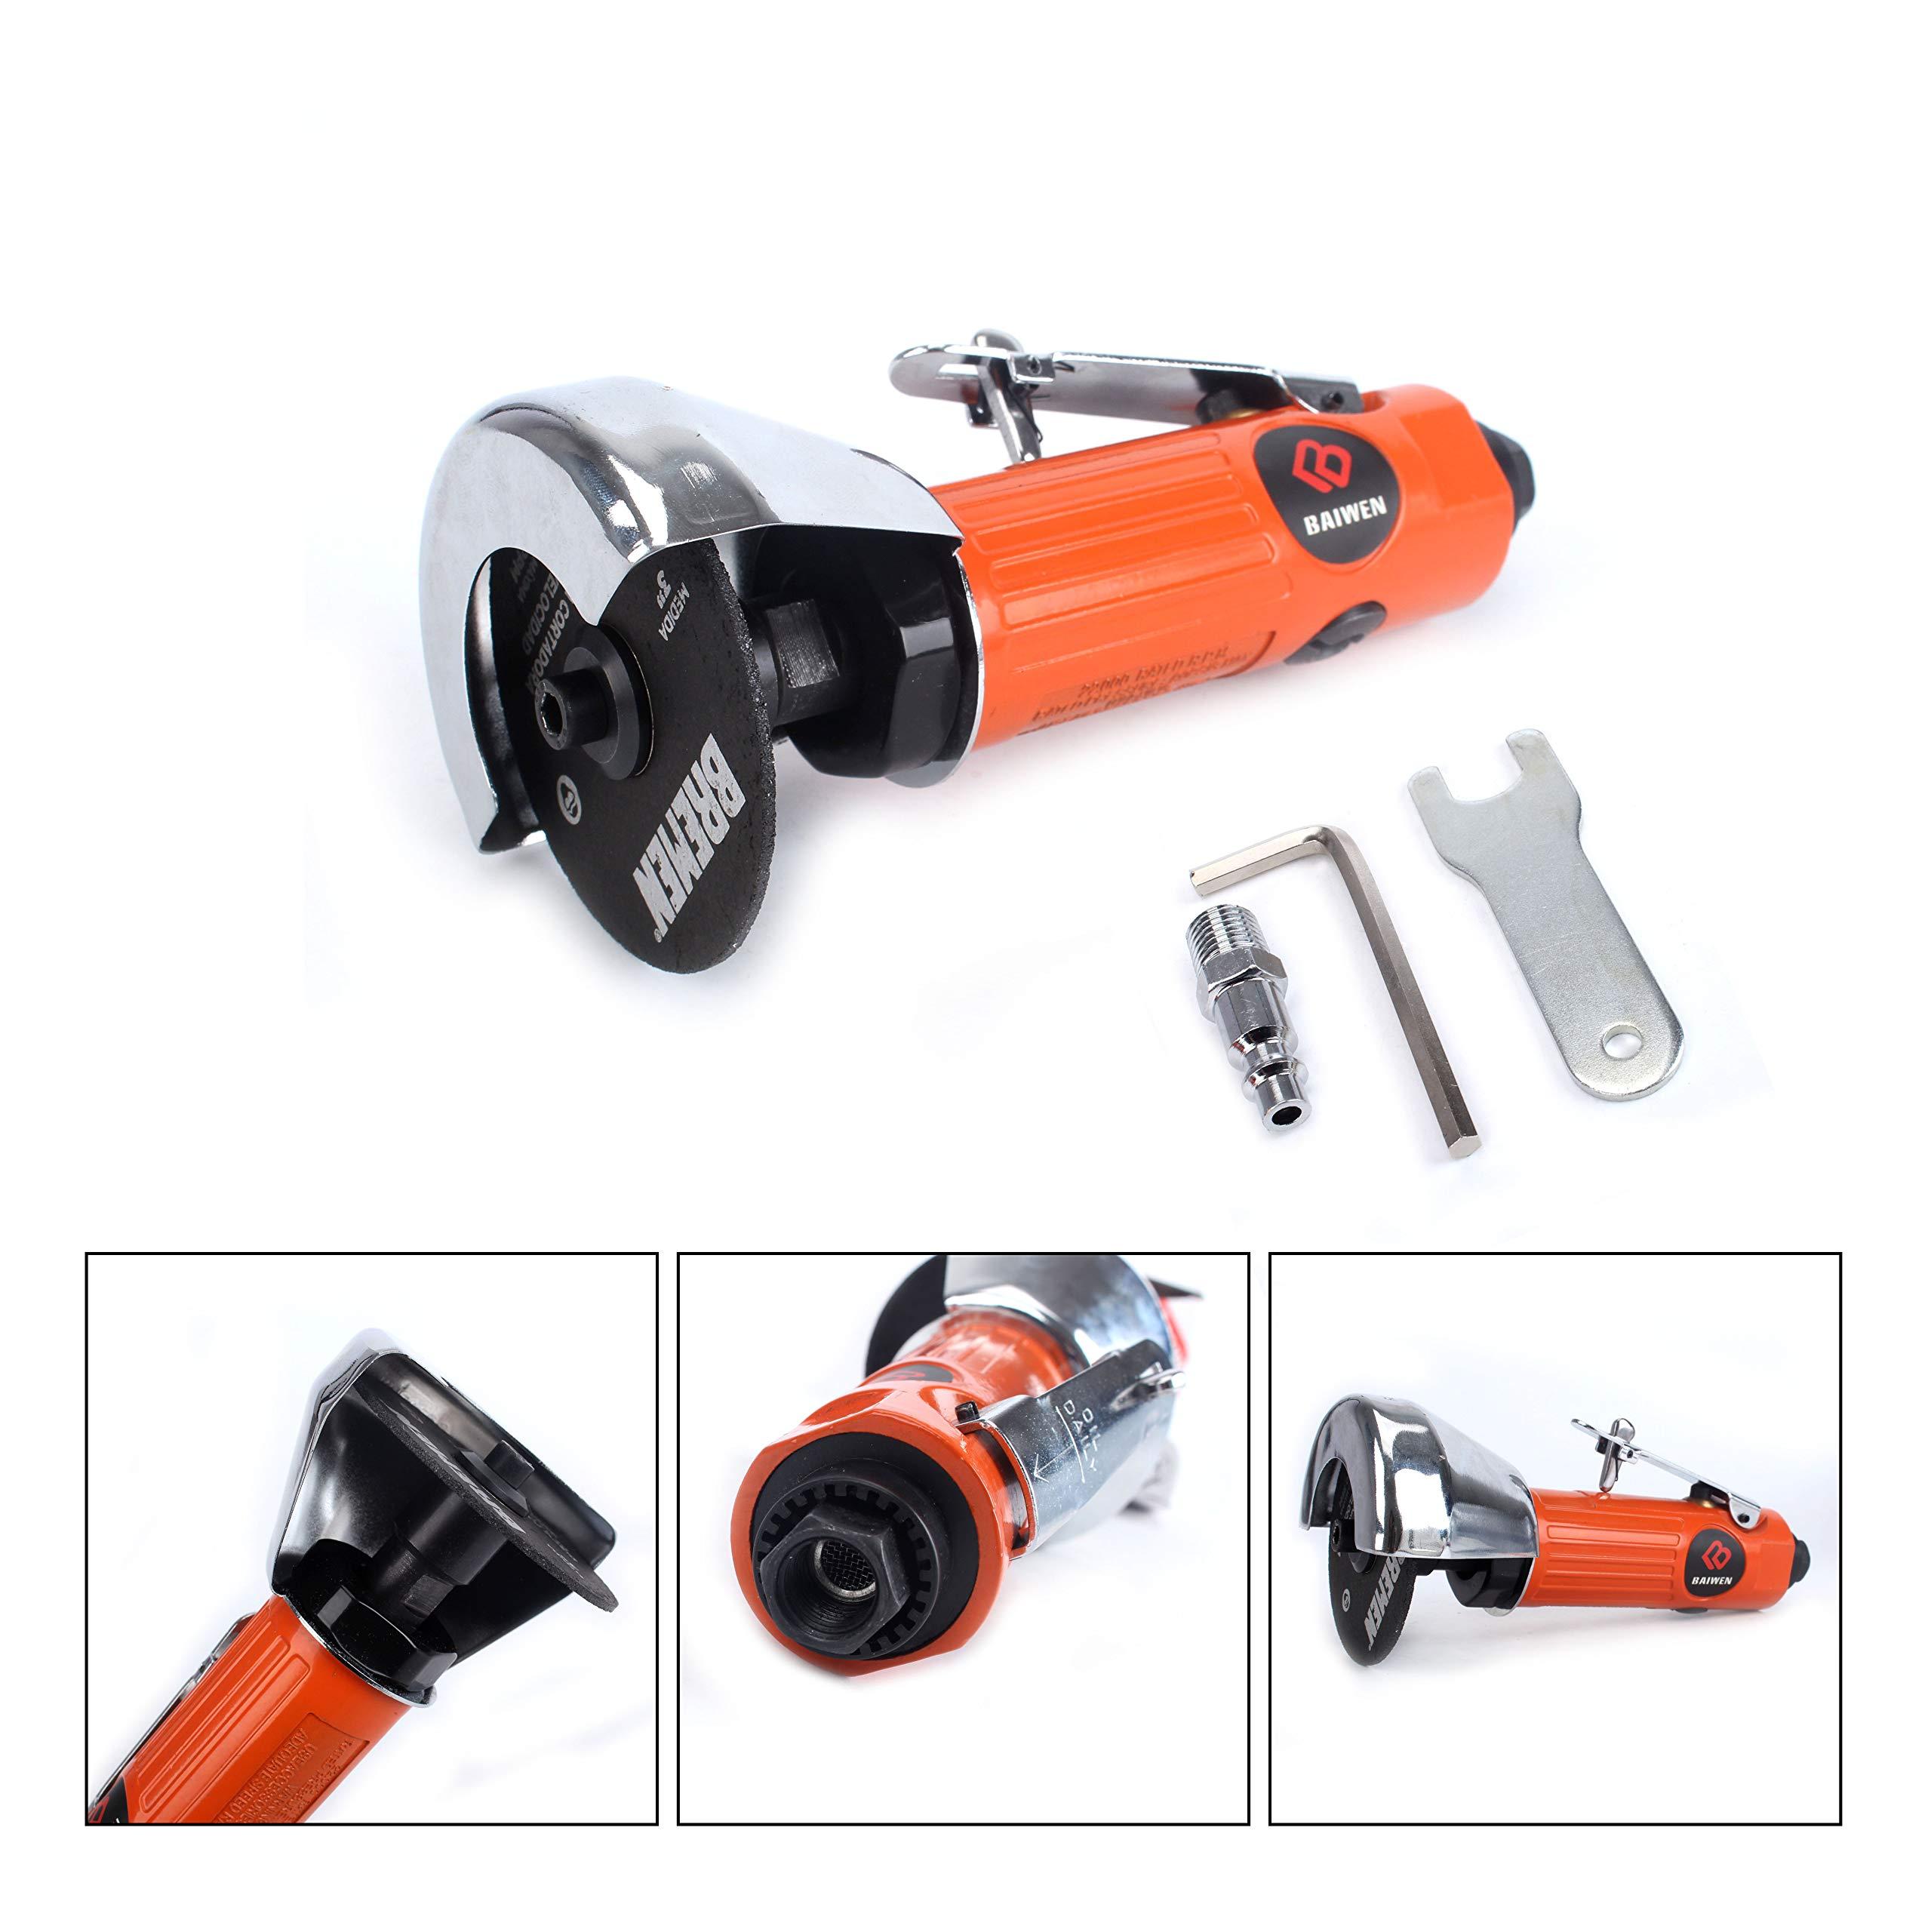 3inch Air Cut Off Tool Include 1Pcs 3'' Cut-off Wheels (3-inch Cutting Tool) by BaiWen